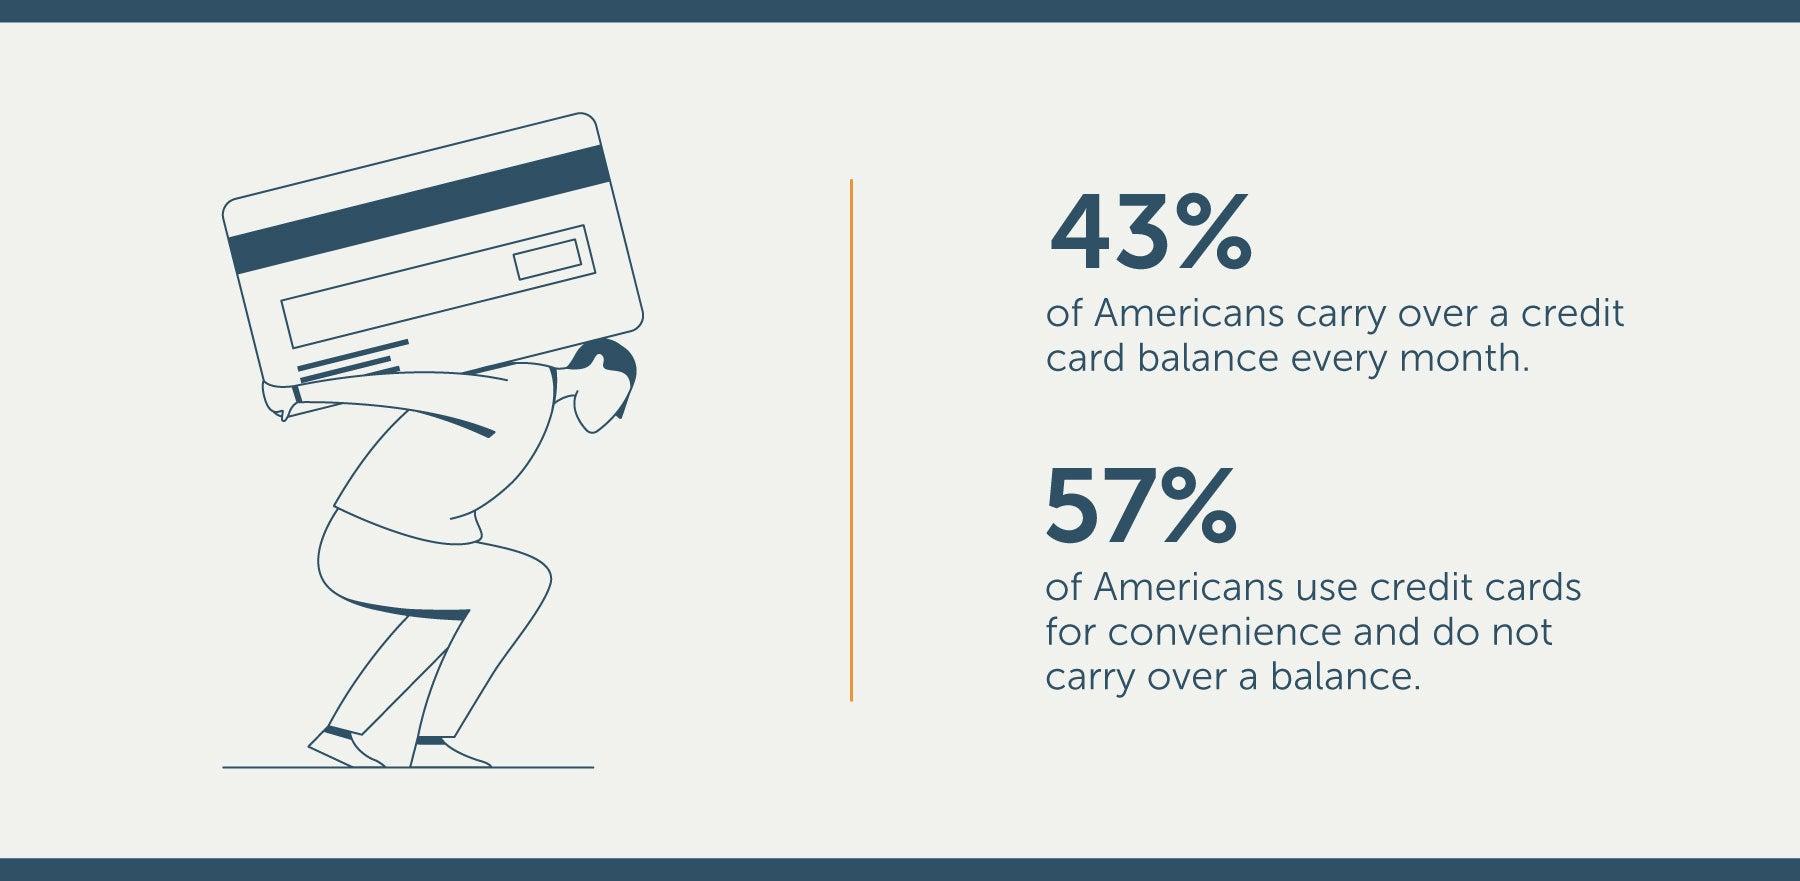 average credit card debt statsitics in america